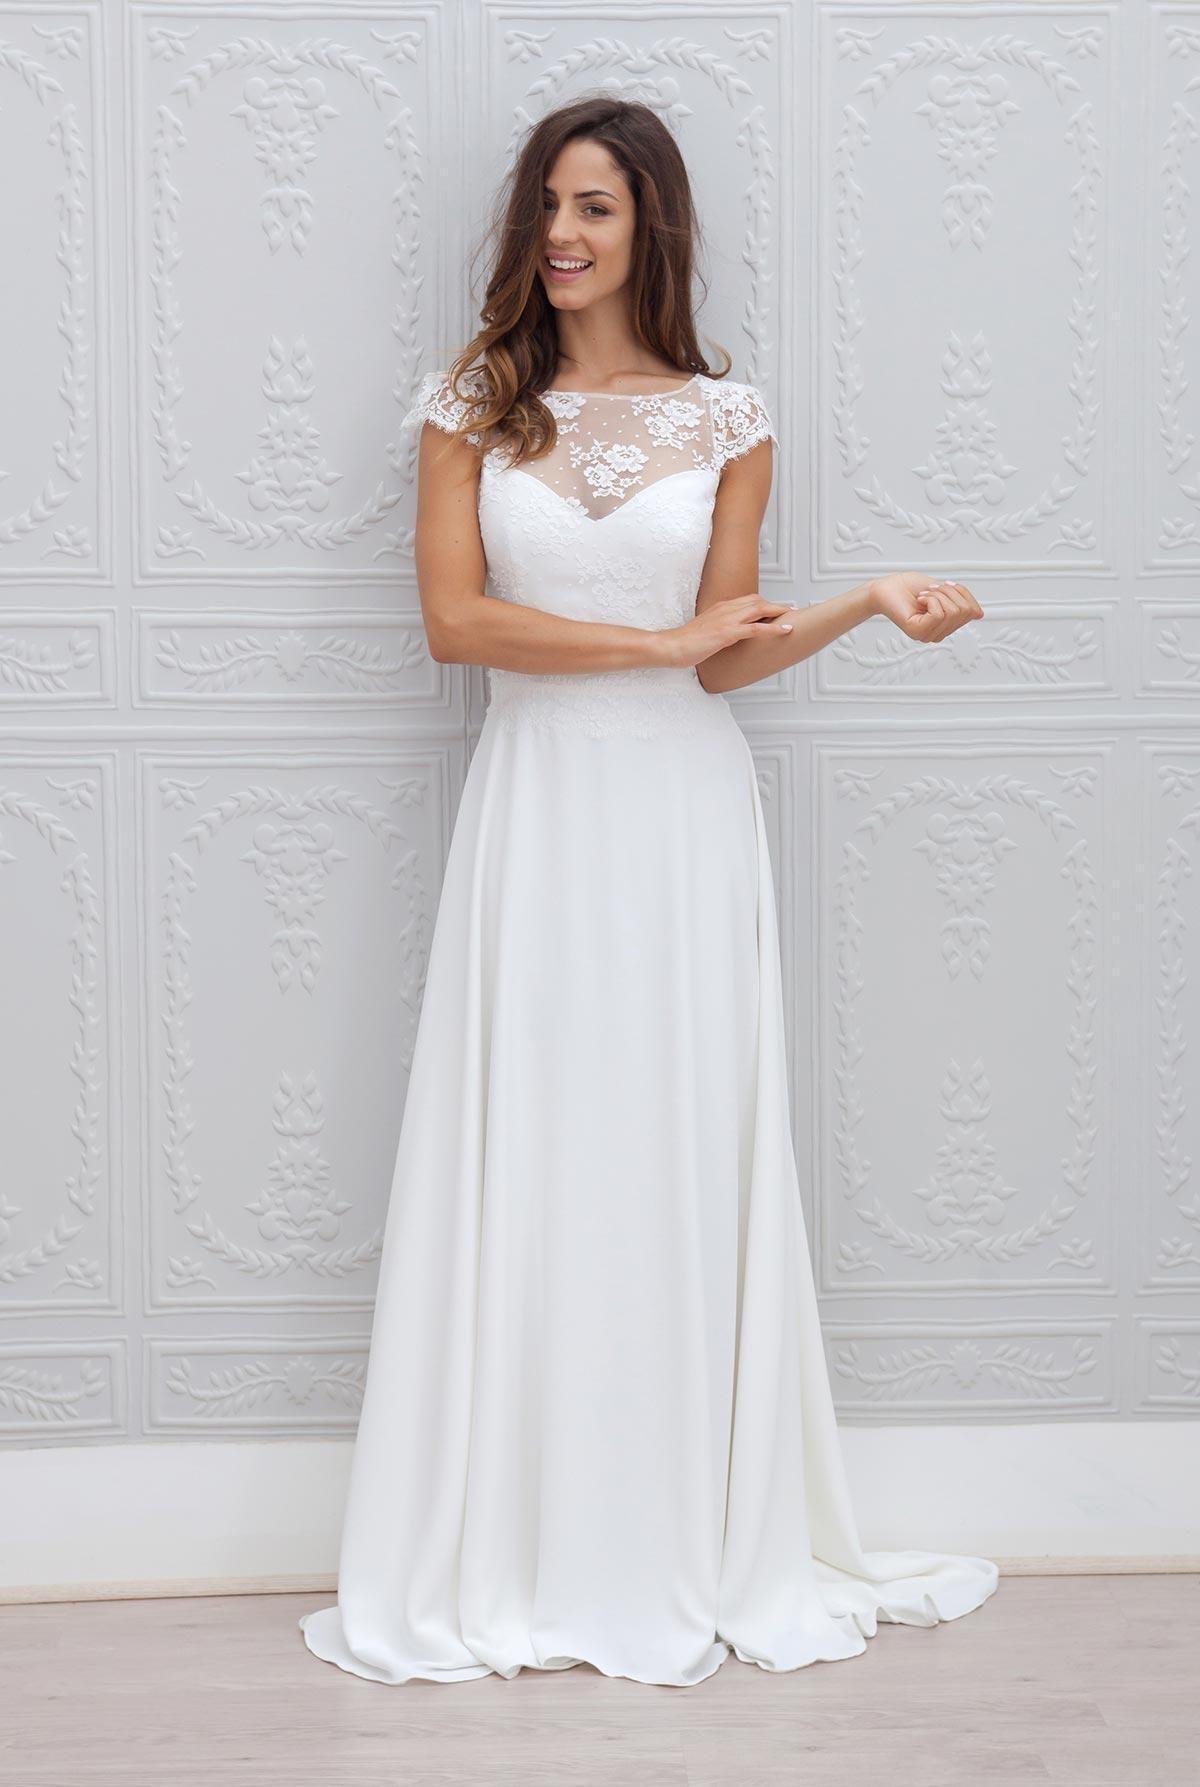 Latest On Sale White Bridal Wedding Dresses Lace Bateau Neck Short